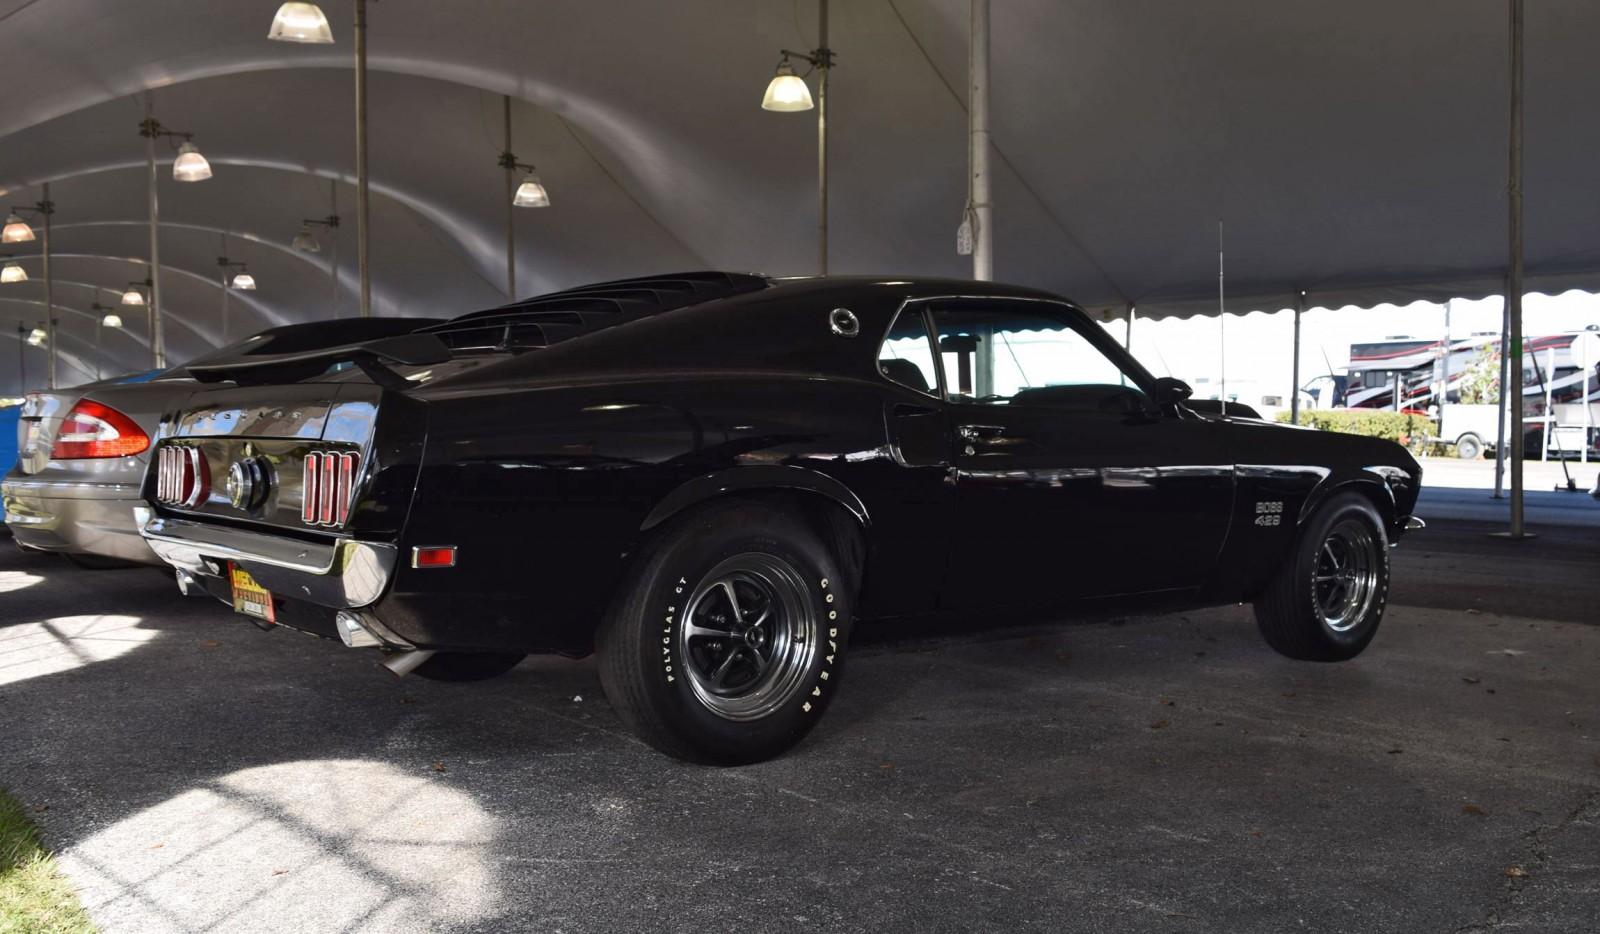 Mecum 2016 Florida Favorites - 1969 Ford Mustang BOSS 429 ...